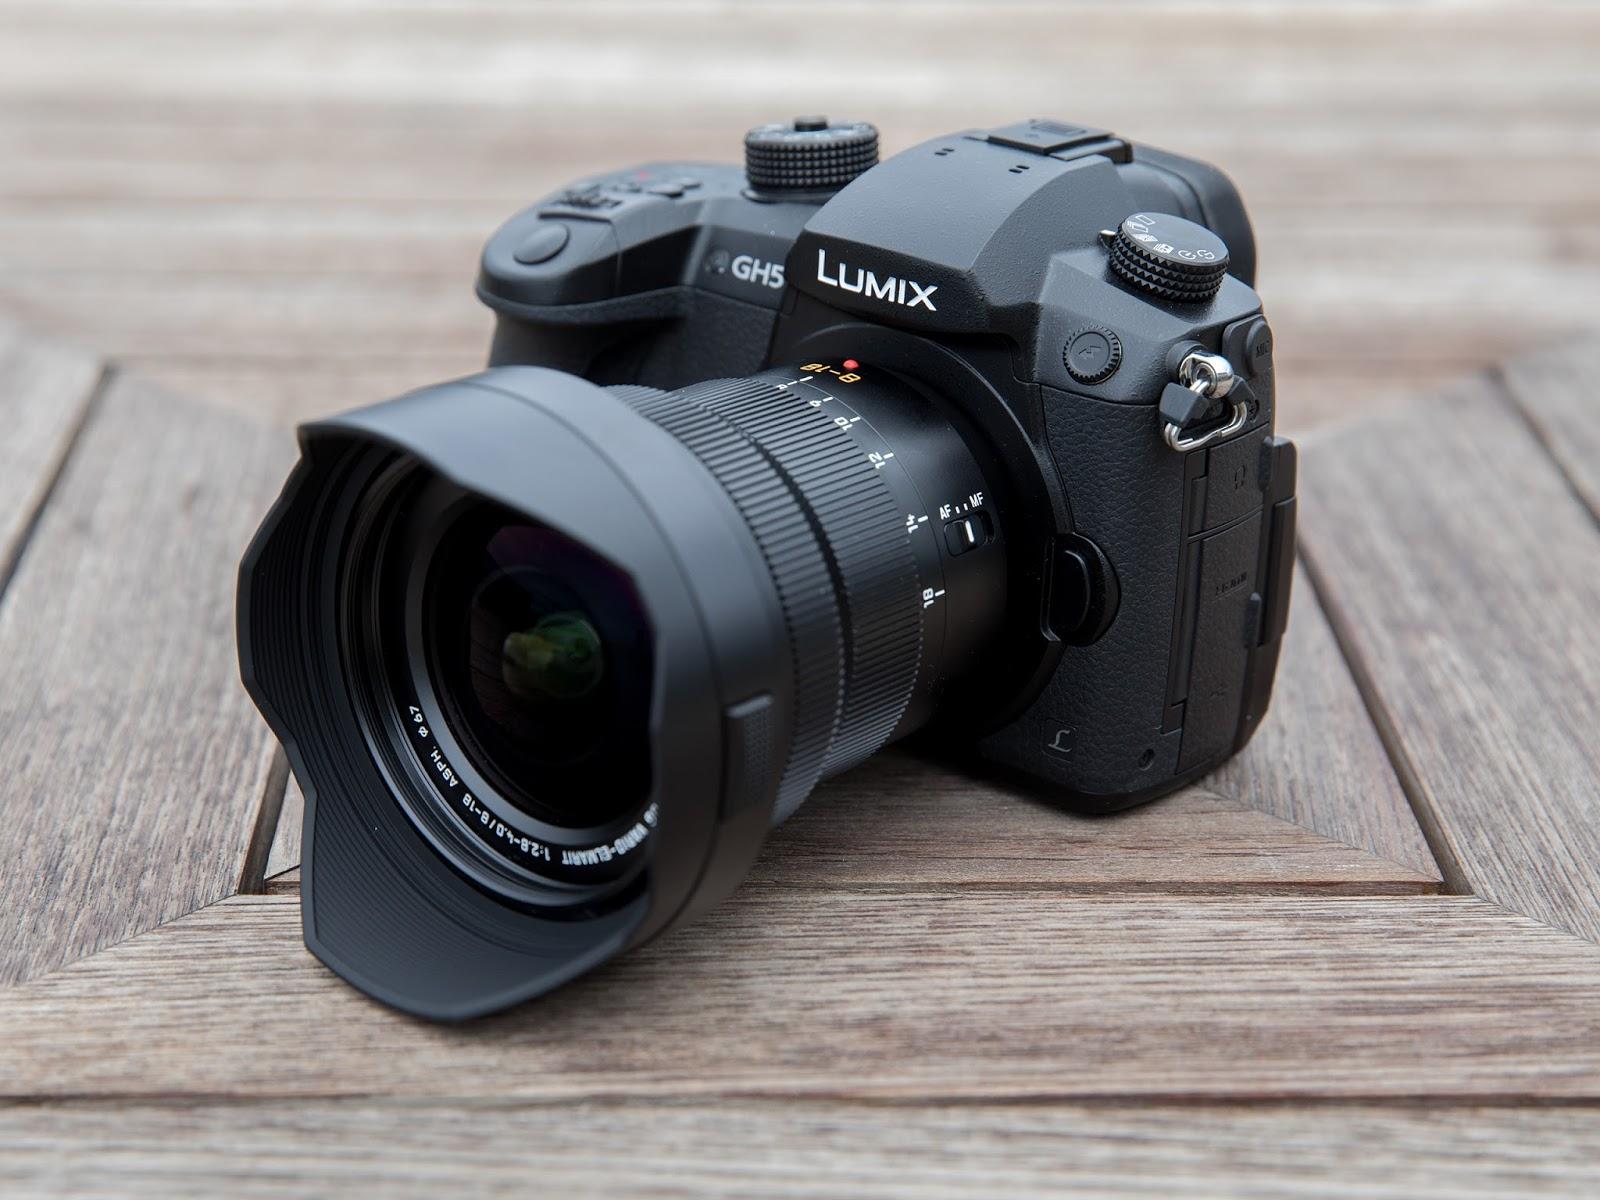 Panasonic Leica DG Vario-Elmarit 8-18mm f/2.8-4 Asph. и Panasonic Lumix GH5